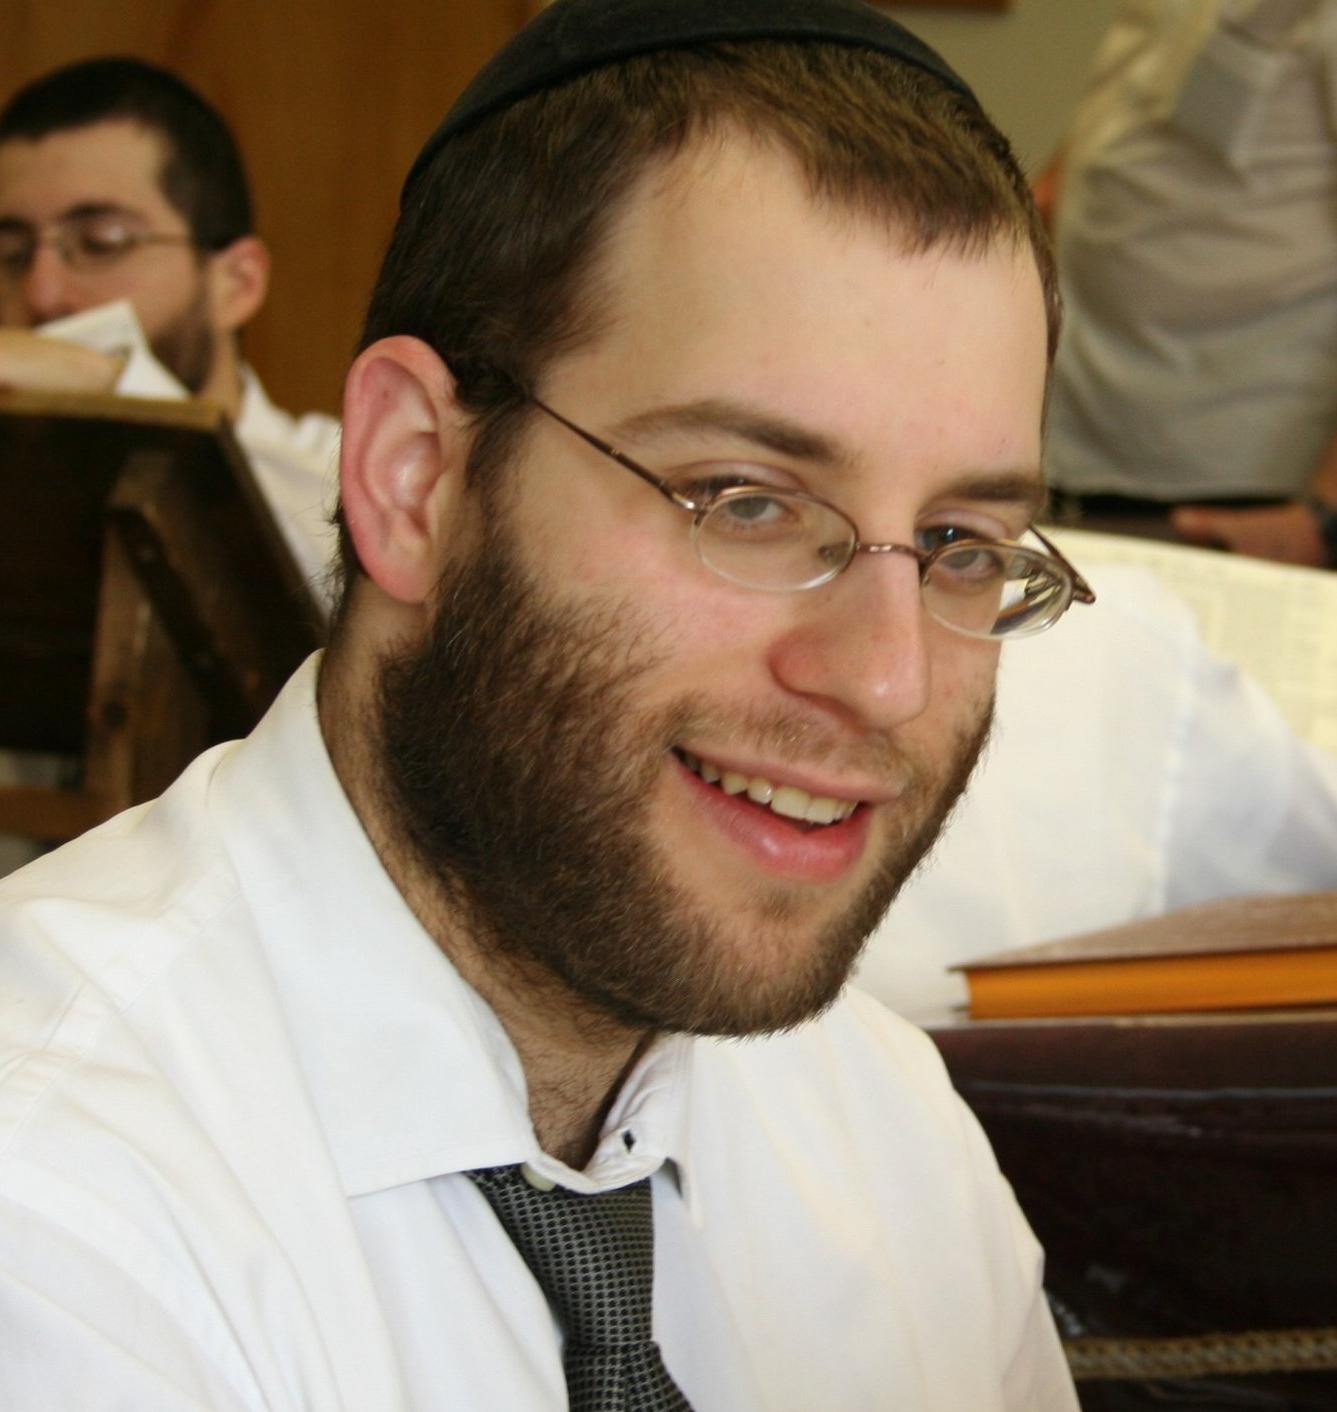 Rabbi Avromi Mayer